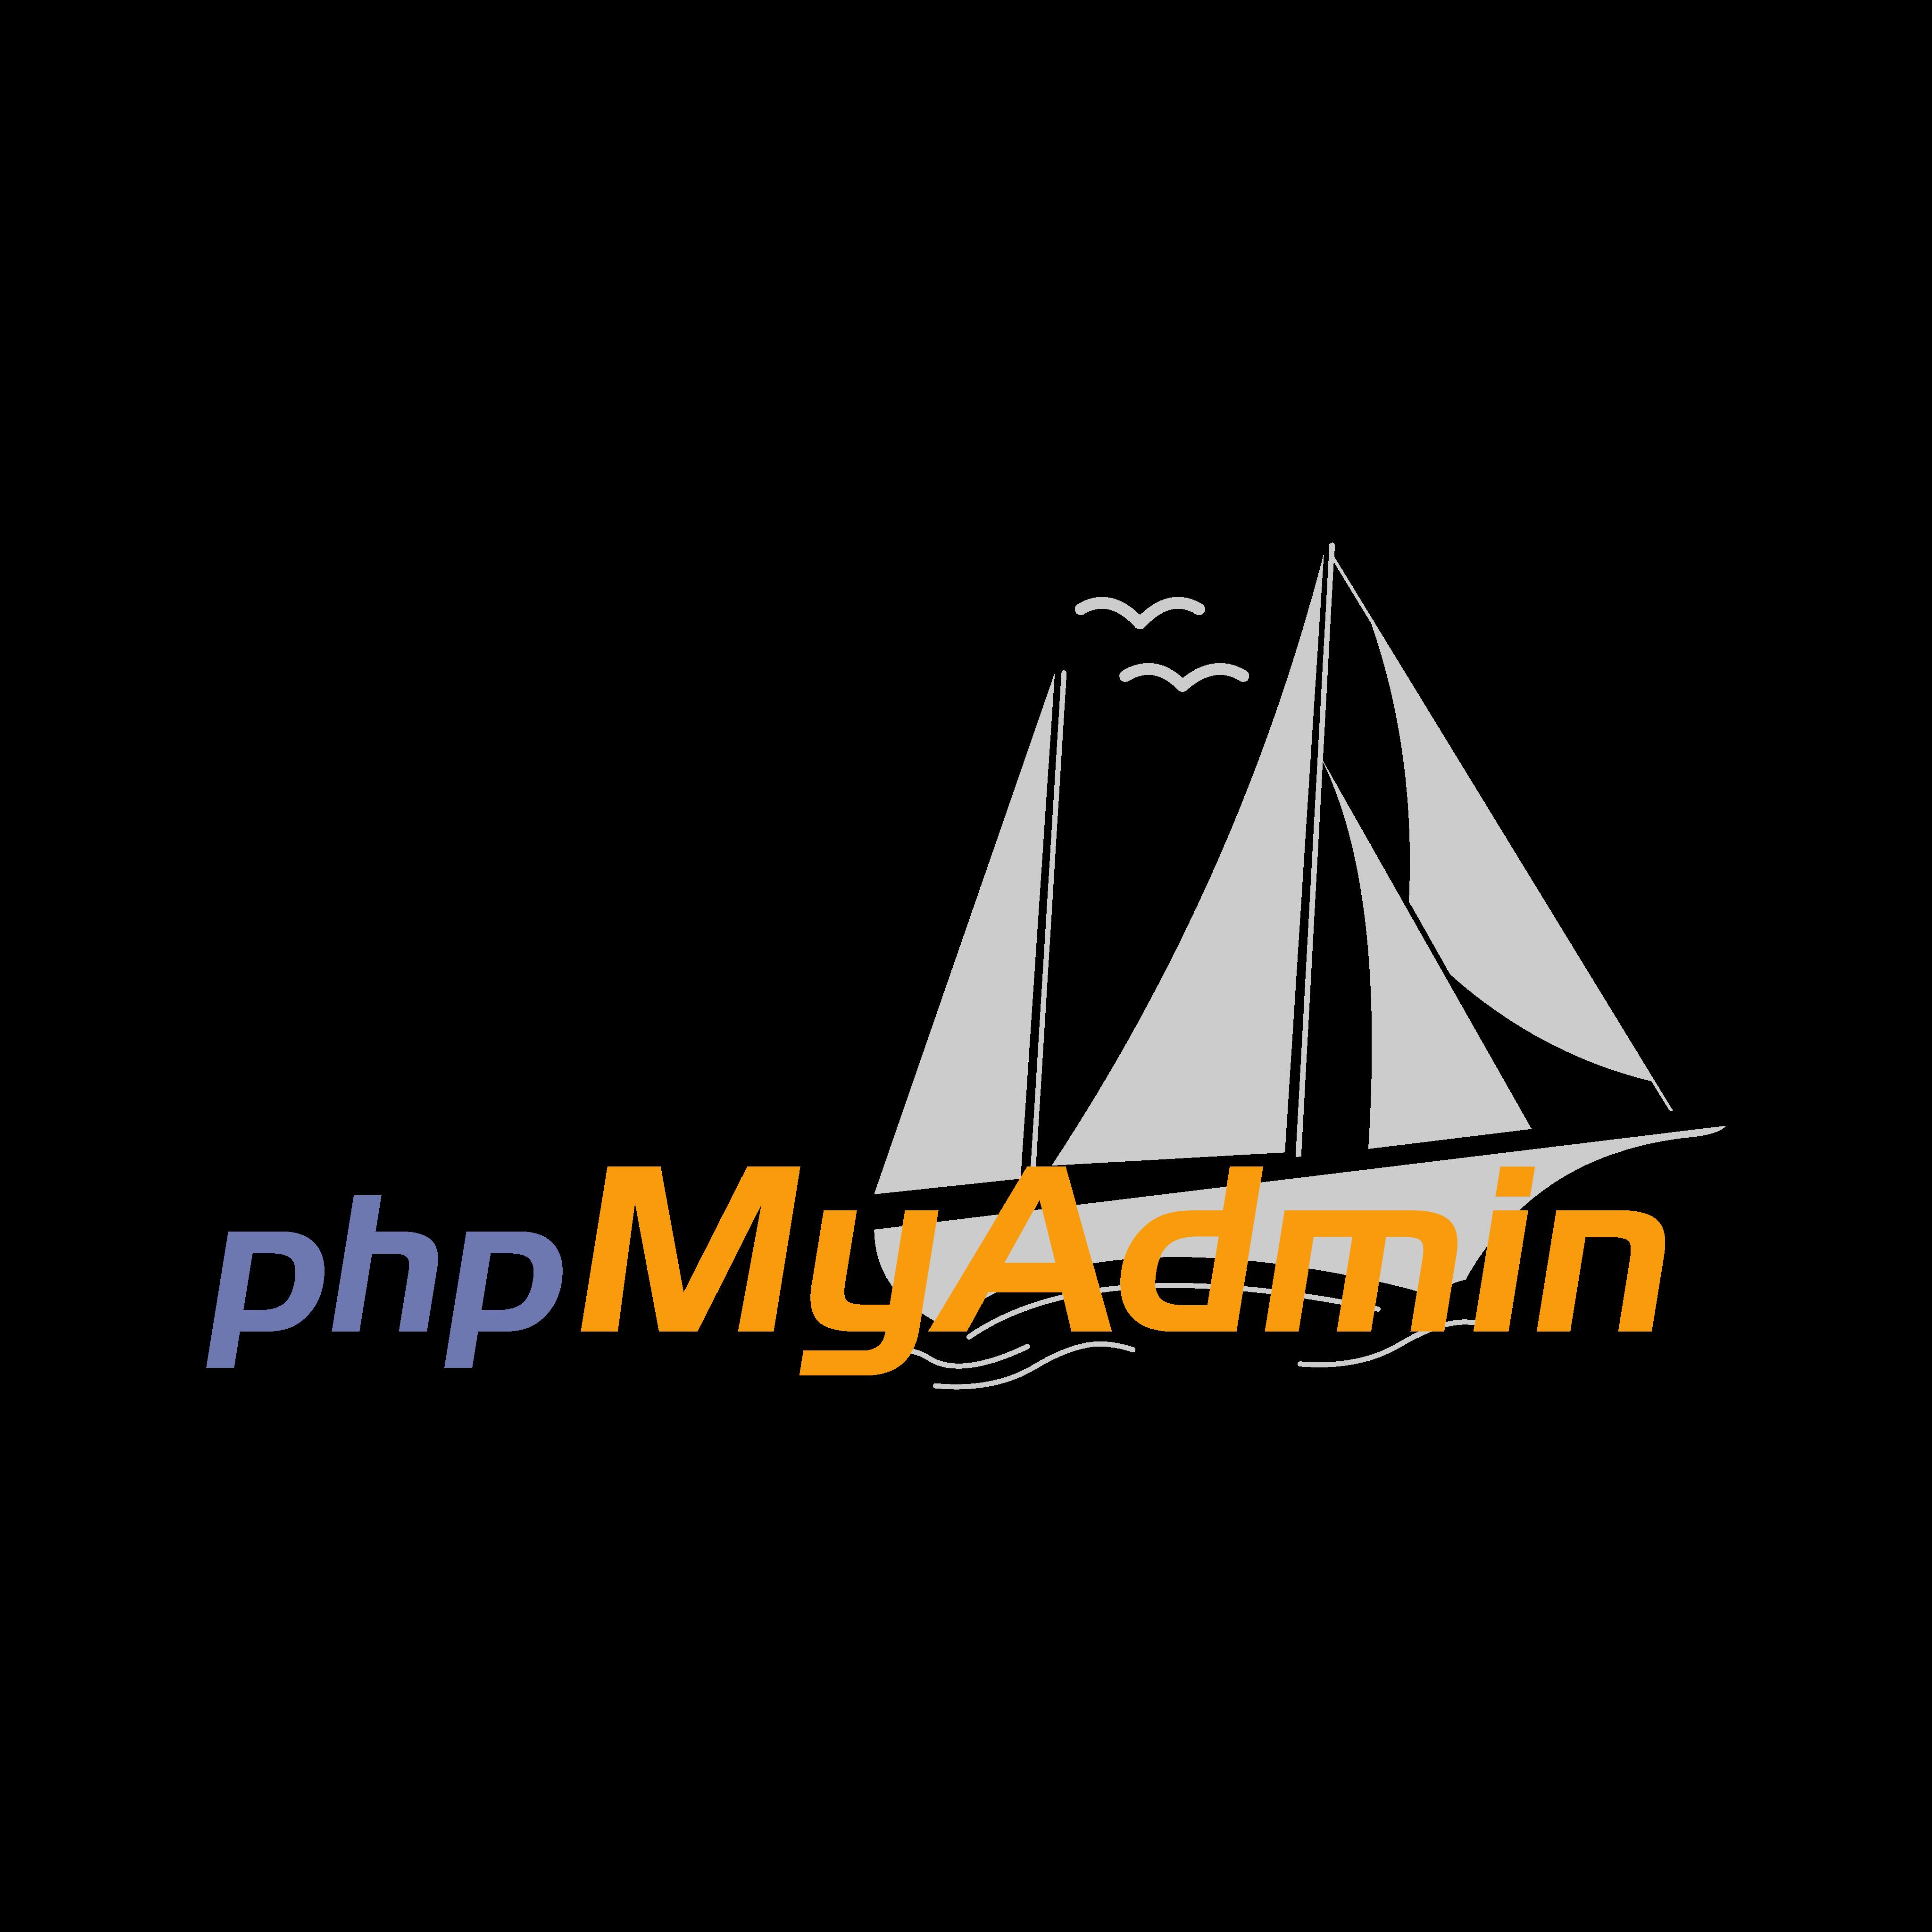 phpmyadmin logo 0 - phpMyAdmin Logo